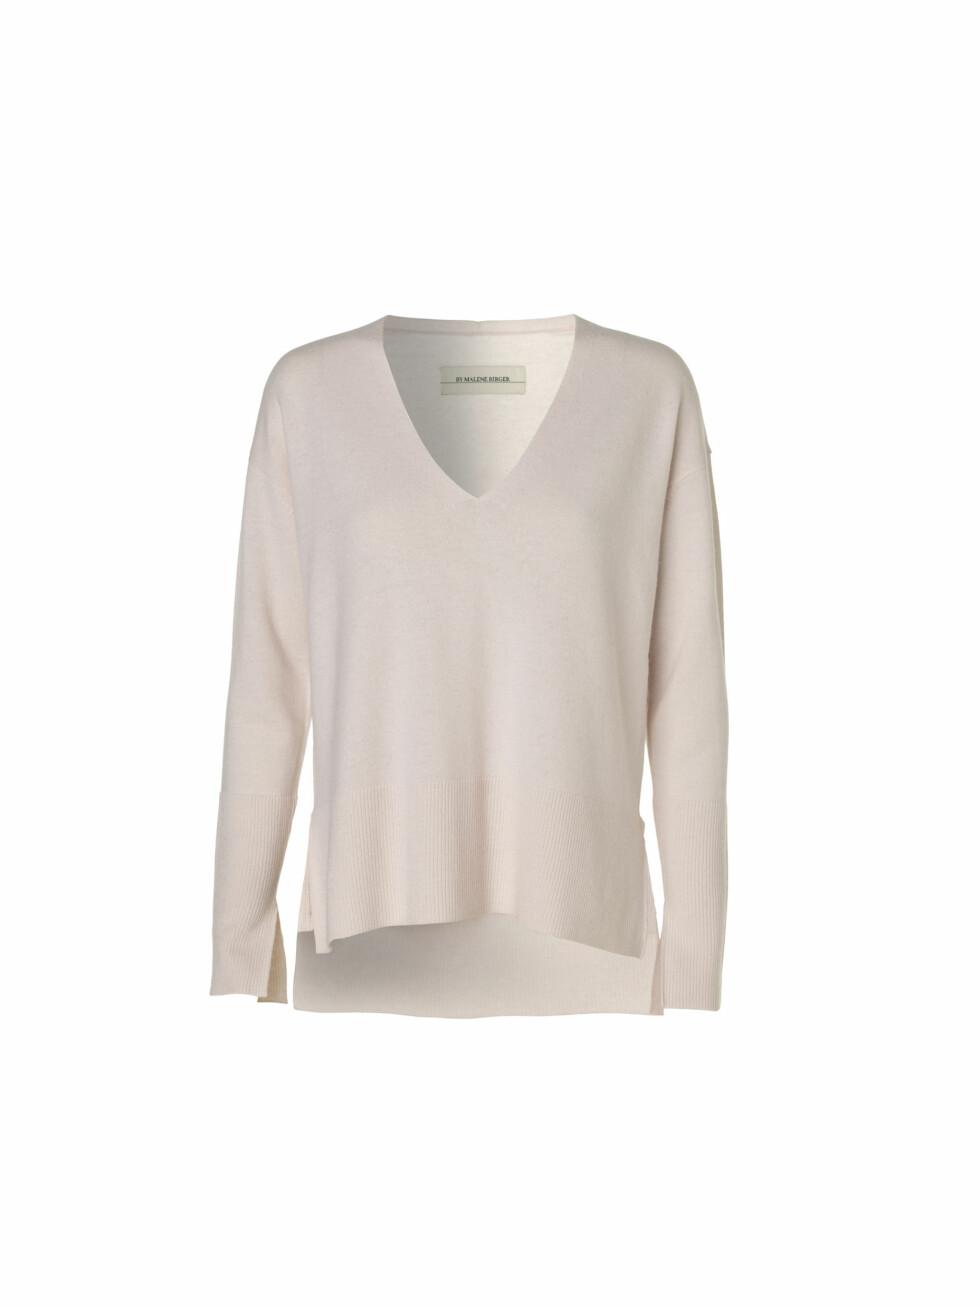 Genser fra By Malene Birger | kr 2100 | http://www.bymalenebirger.com/no/knitwear/accina-sweater-Q57732028.html?cgid=ec9eefcfe717b9e9caa25861ababfcc20d149ca2&dwvar_Q57732028_color=5BZ